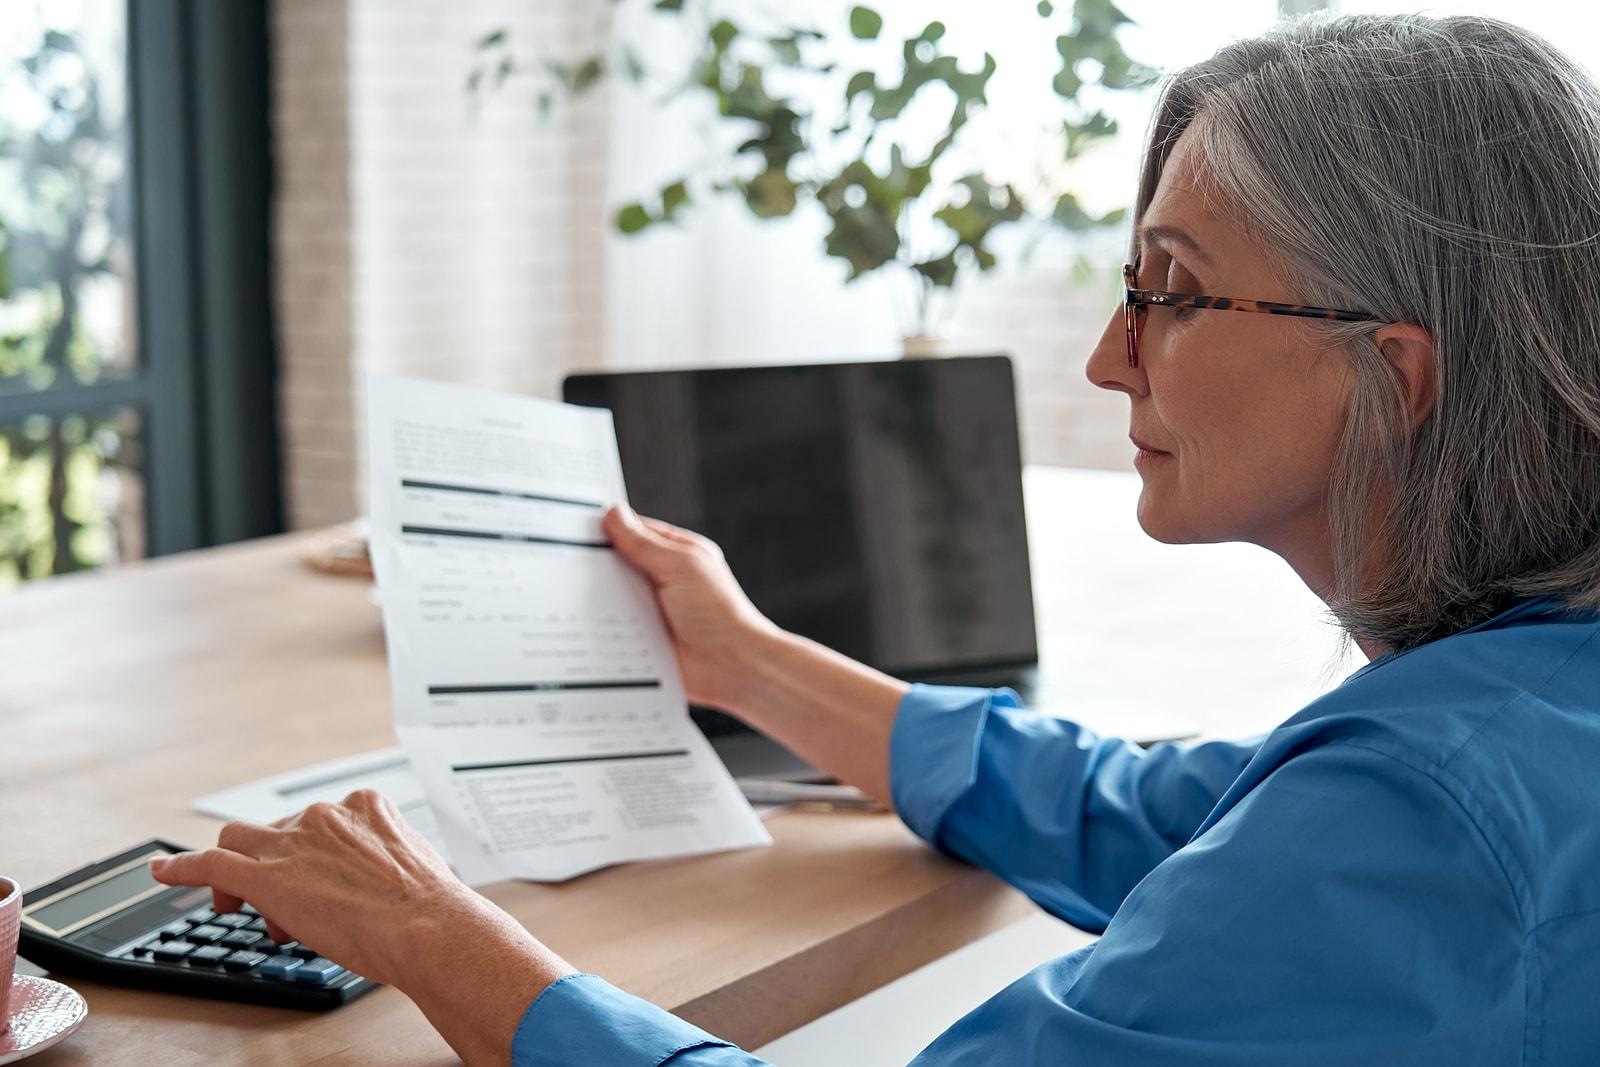 bigstock-Senior-Mature-Business-Woman-H-387135688-min